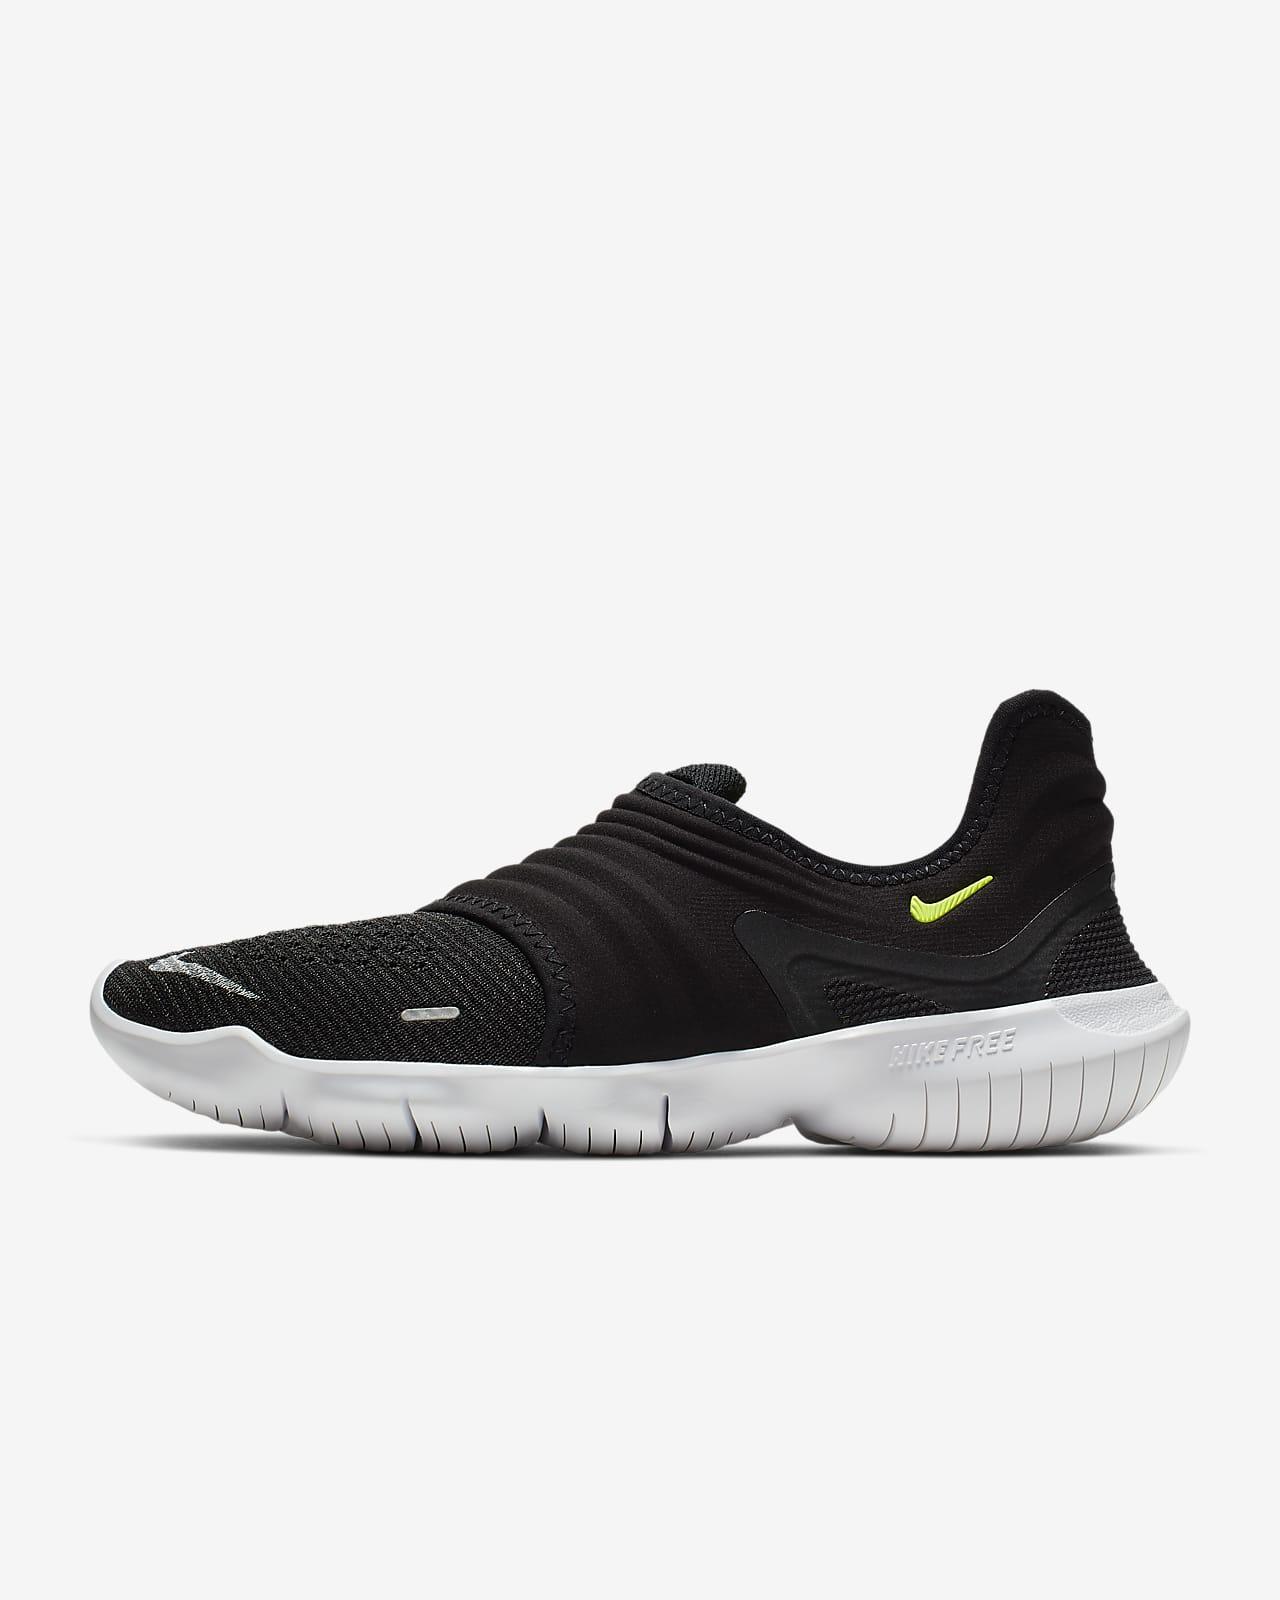 Nike Free RN Flyknit 3.0 女款跑鞋。Nike TW